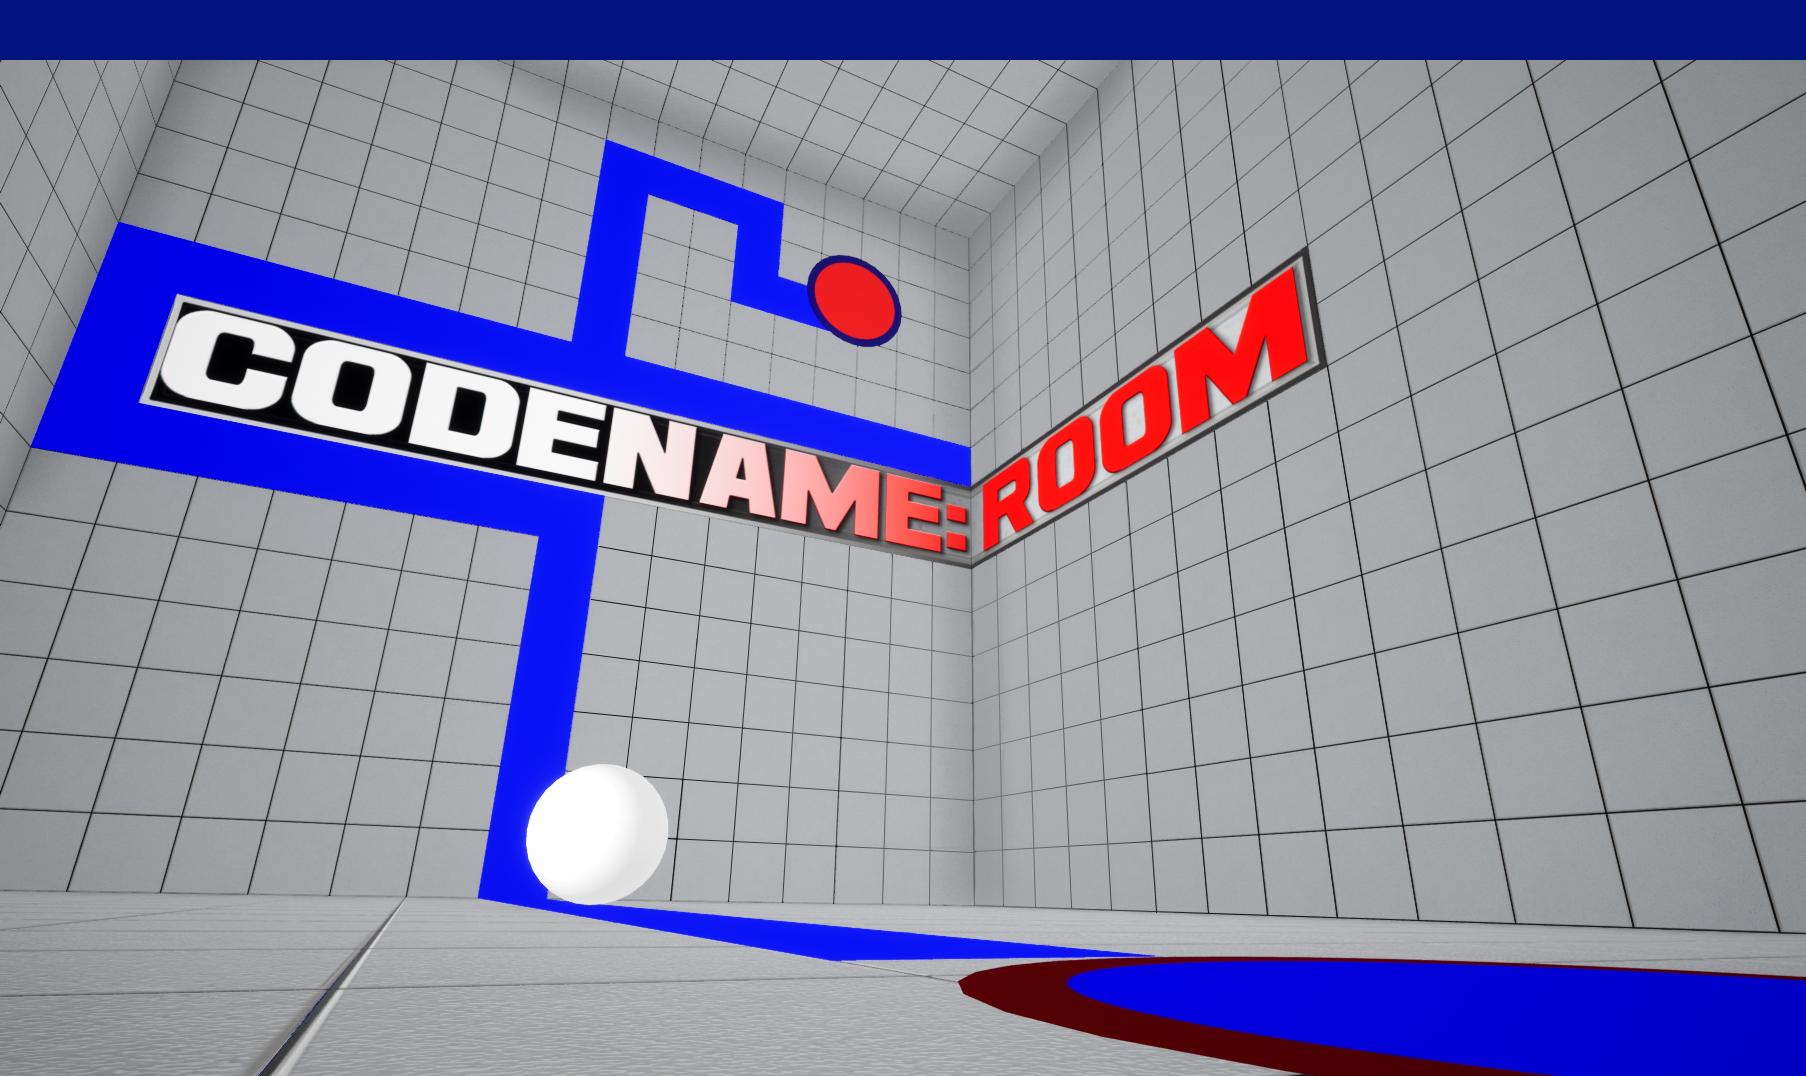 Codename: Room